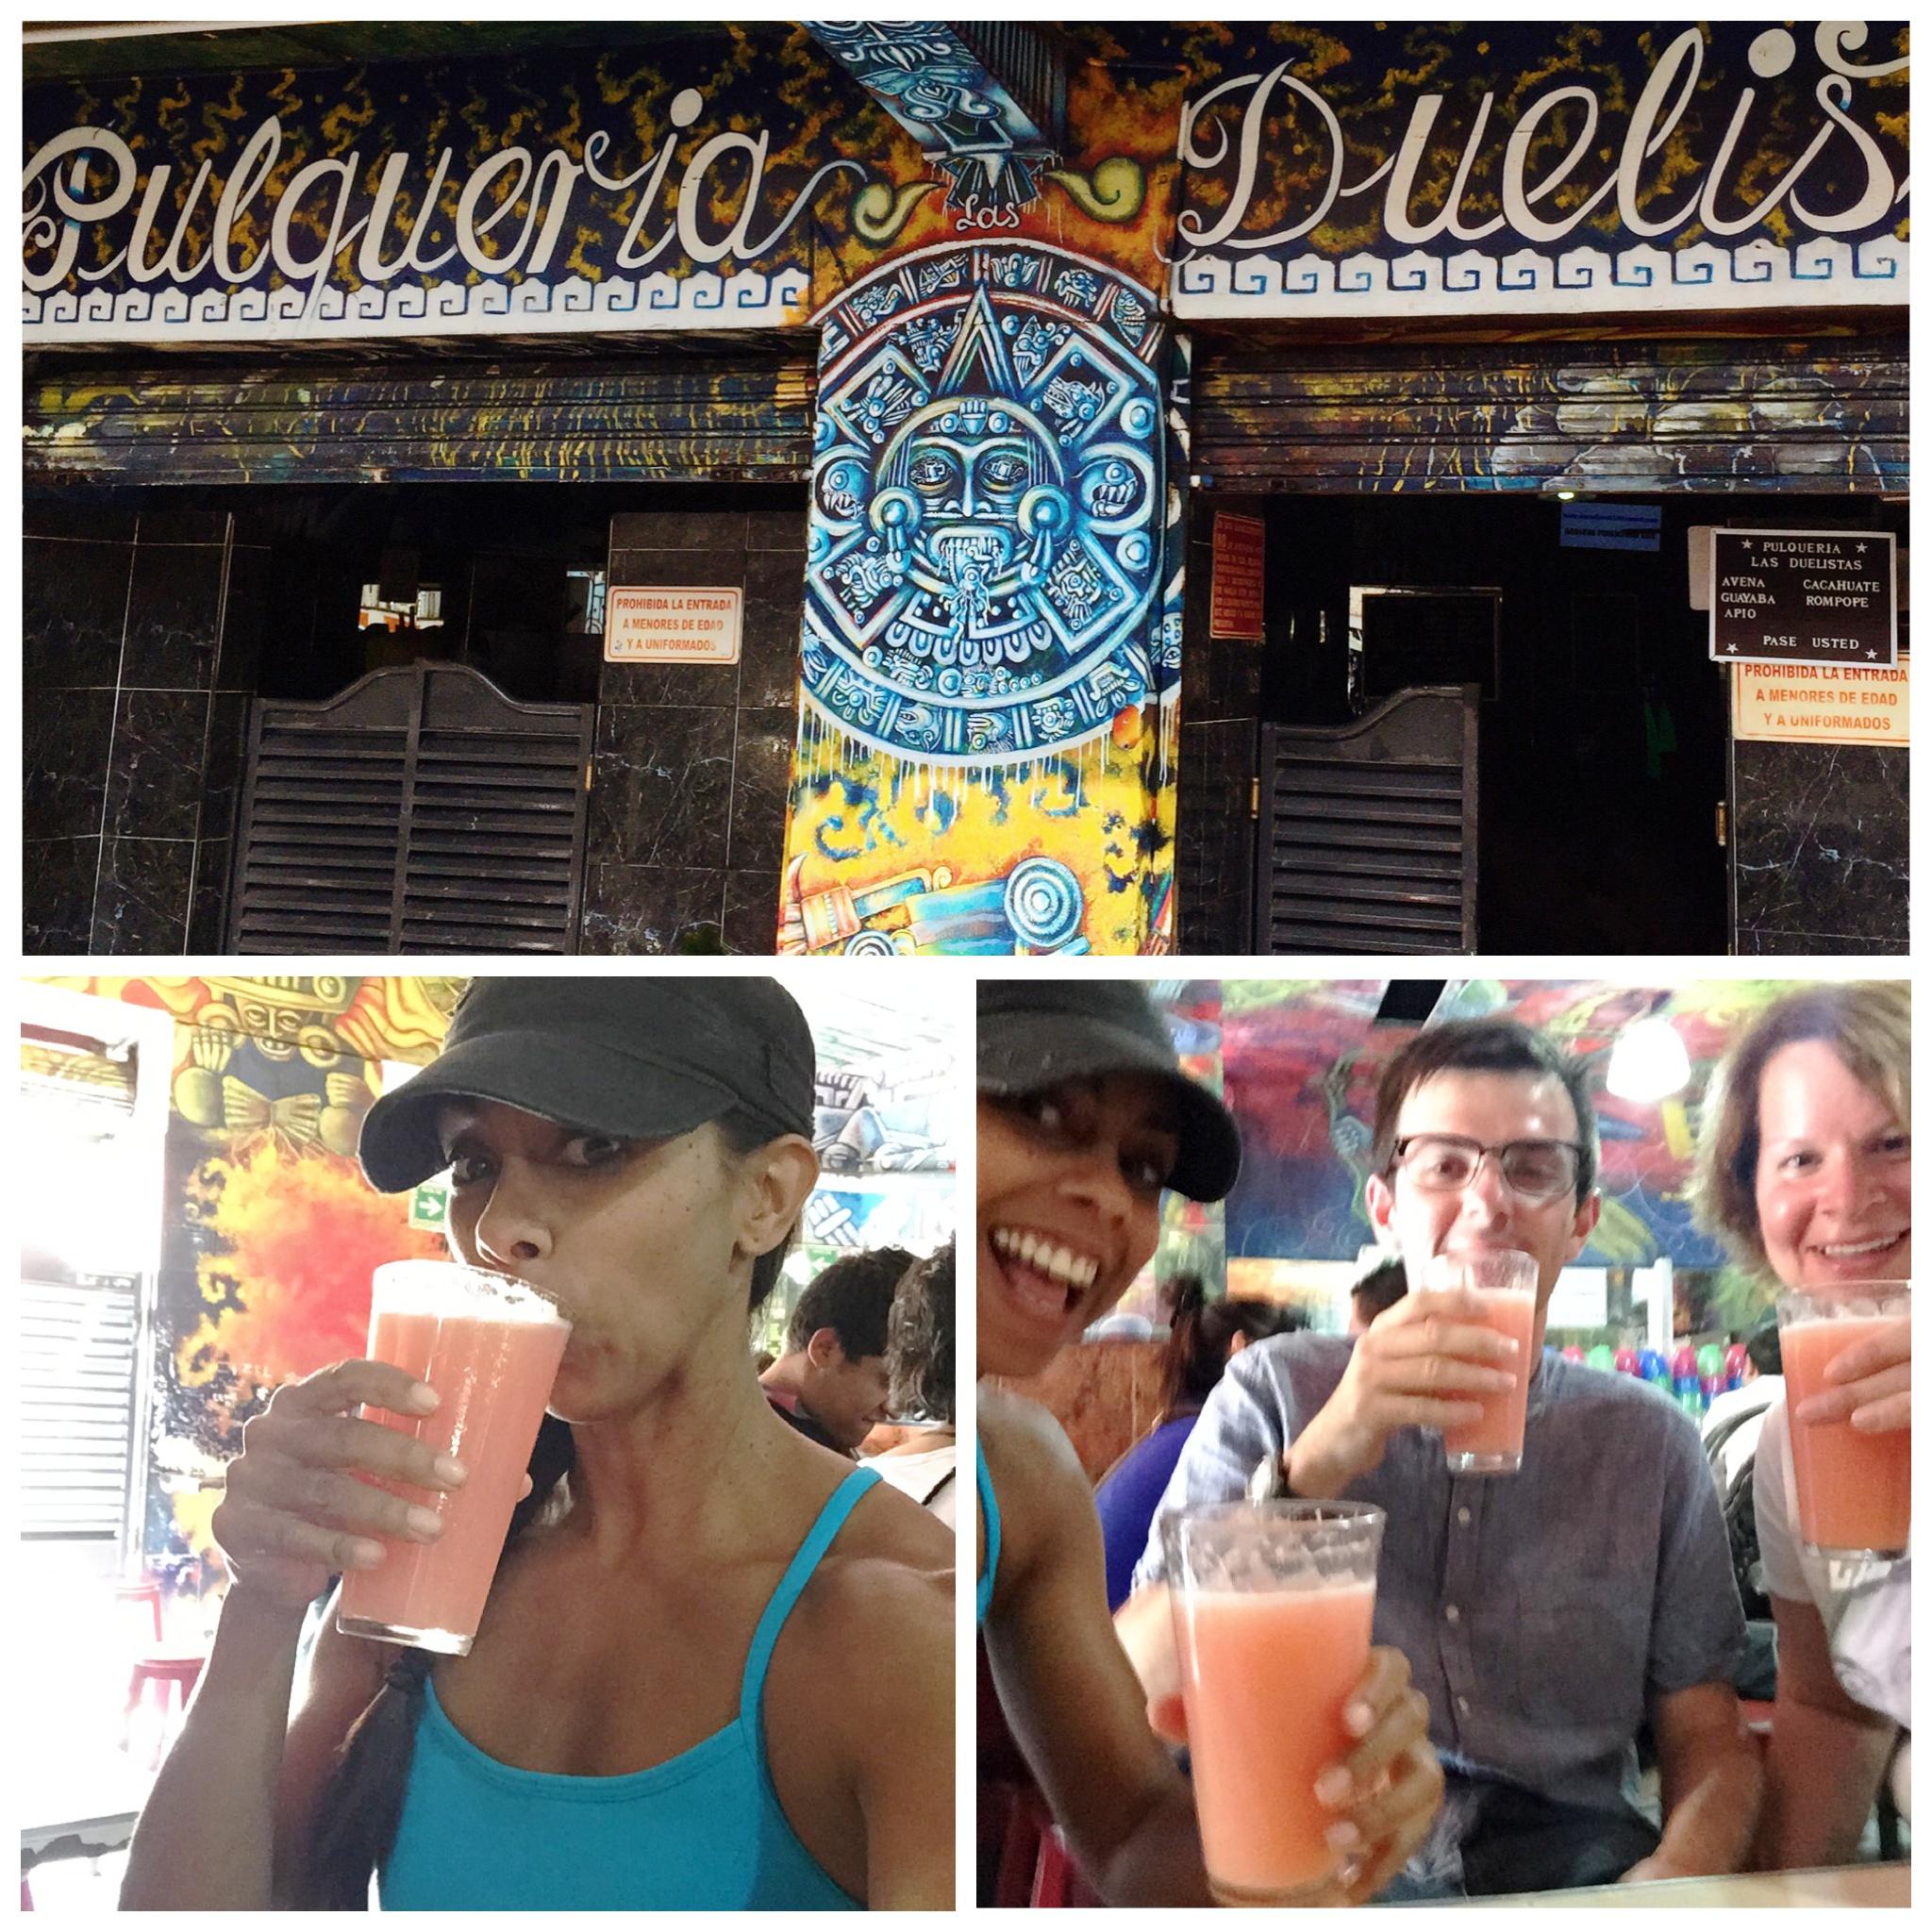 pulqueria-in-mexico-city.jpg